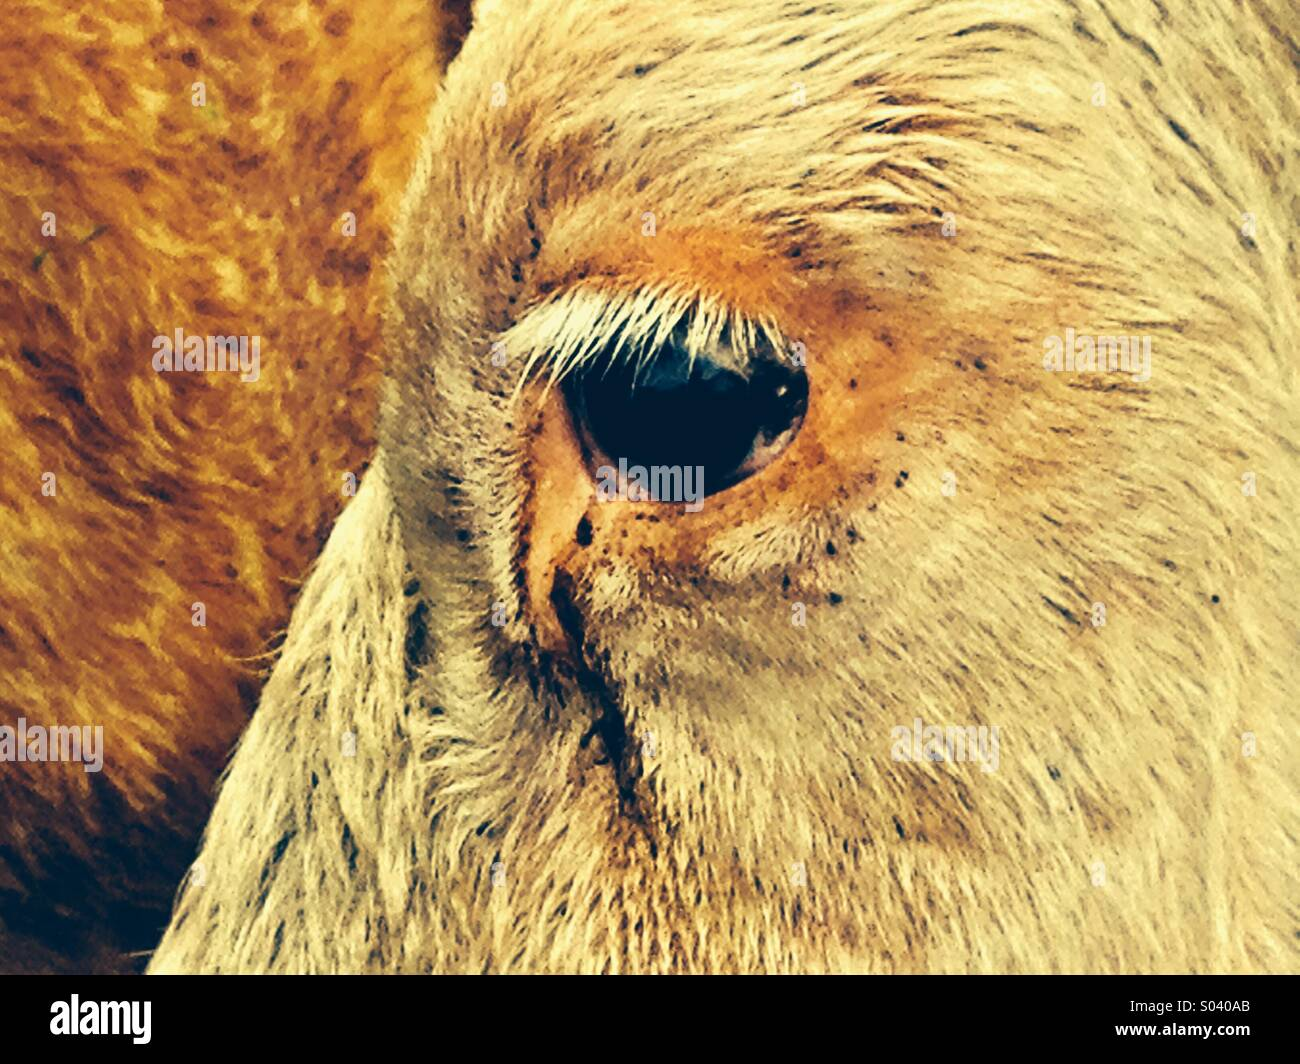 Pestaña de vaca Foto de stock